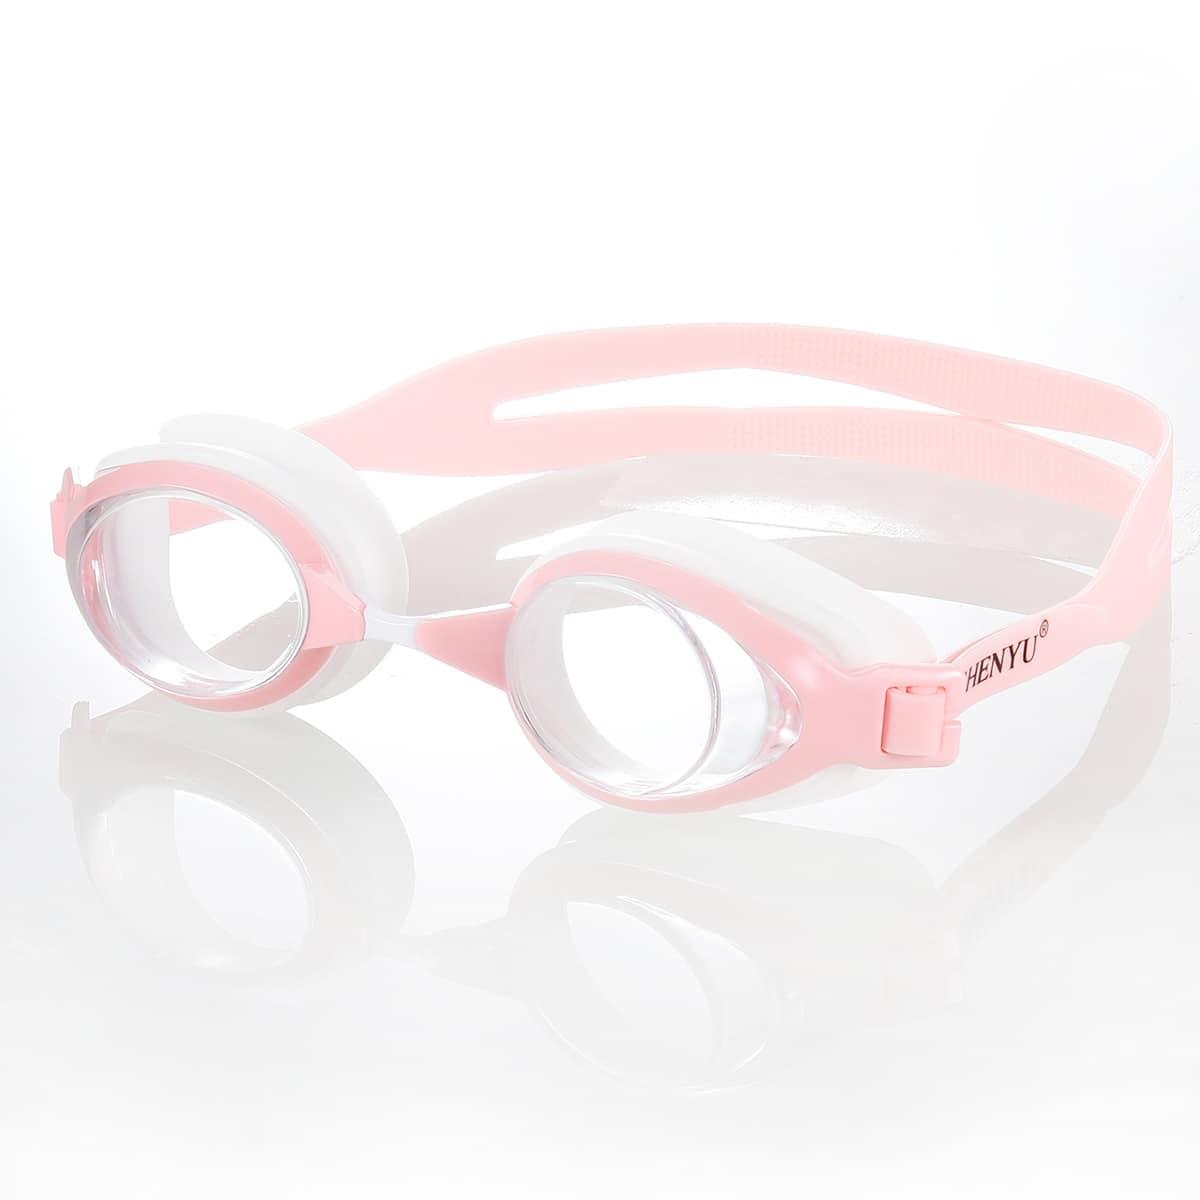 Очки для плавания против запотевания